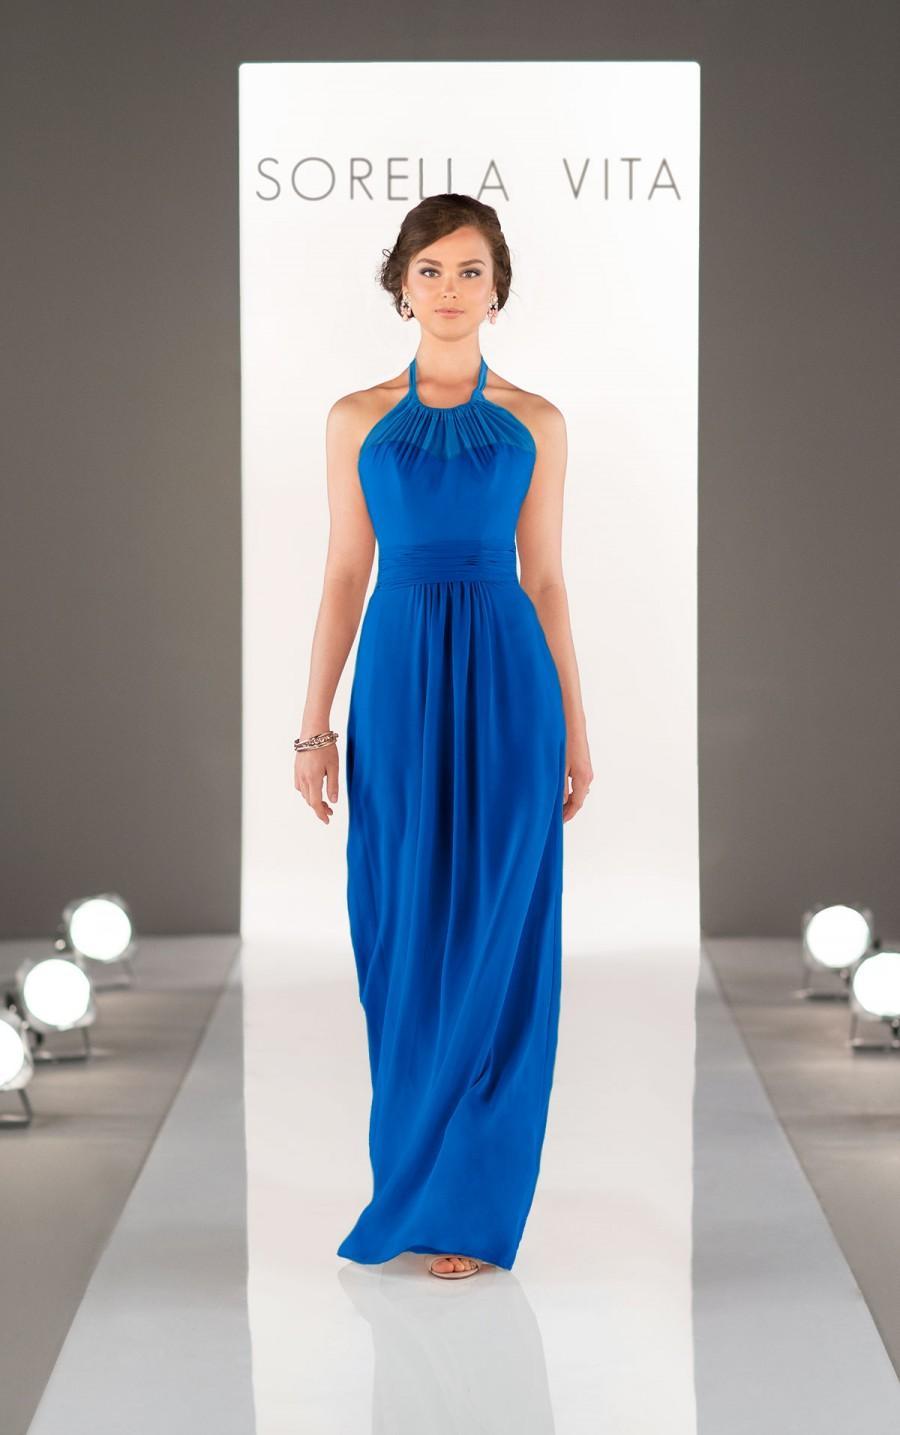 Sorella Vita Flirty Bridesmaid Dress Style